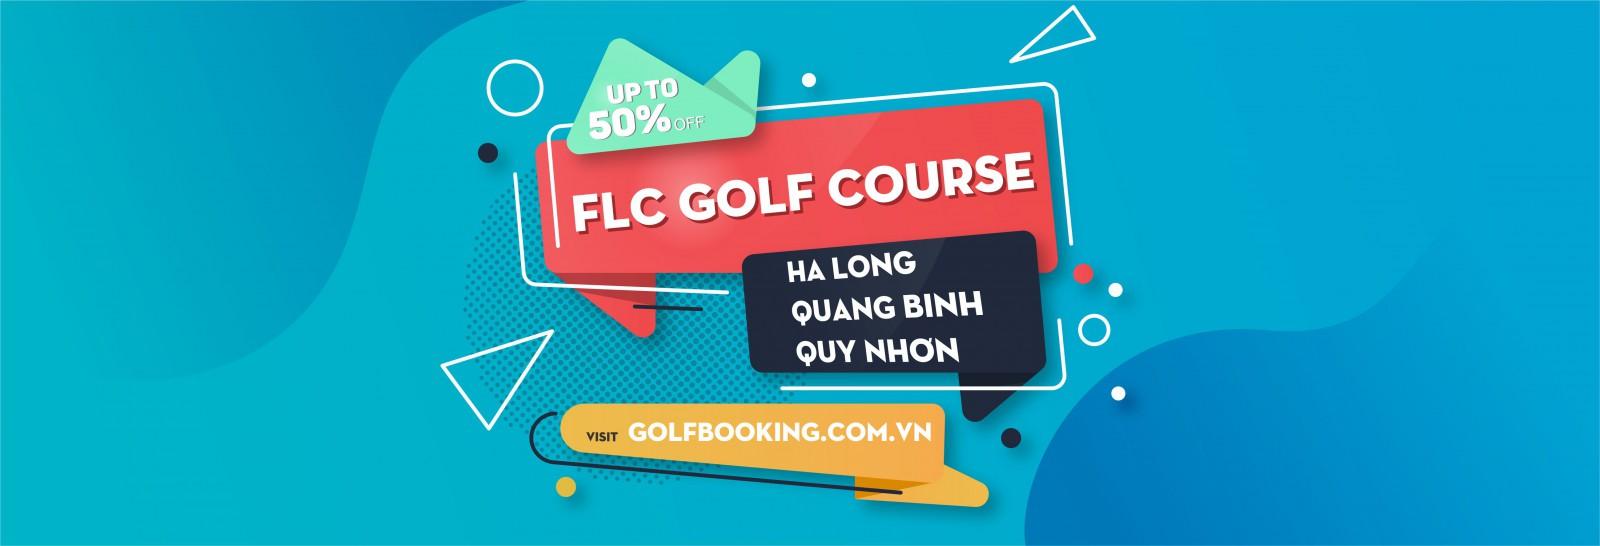 FLC GOLF COURSE PROMOTION - GIẢM GIÁ SỐC